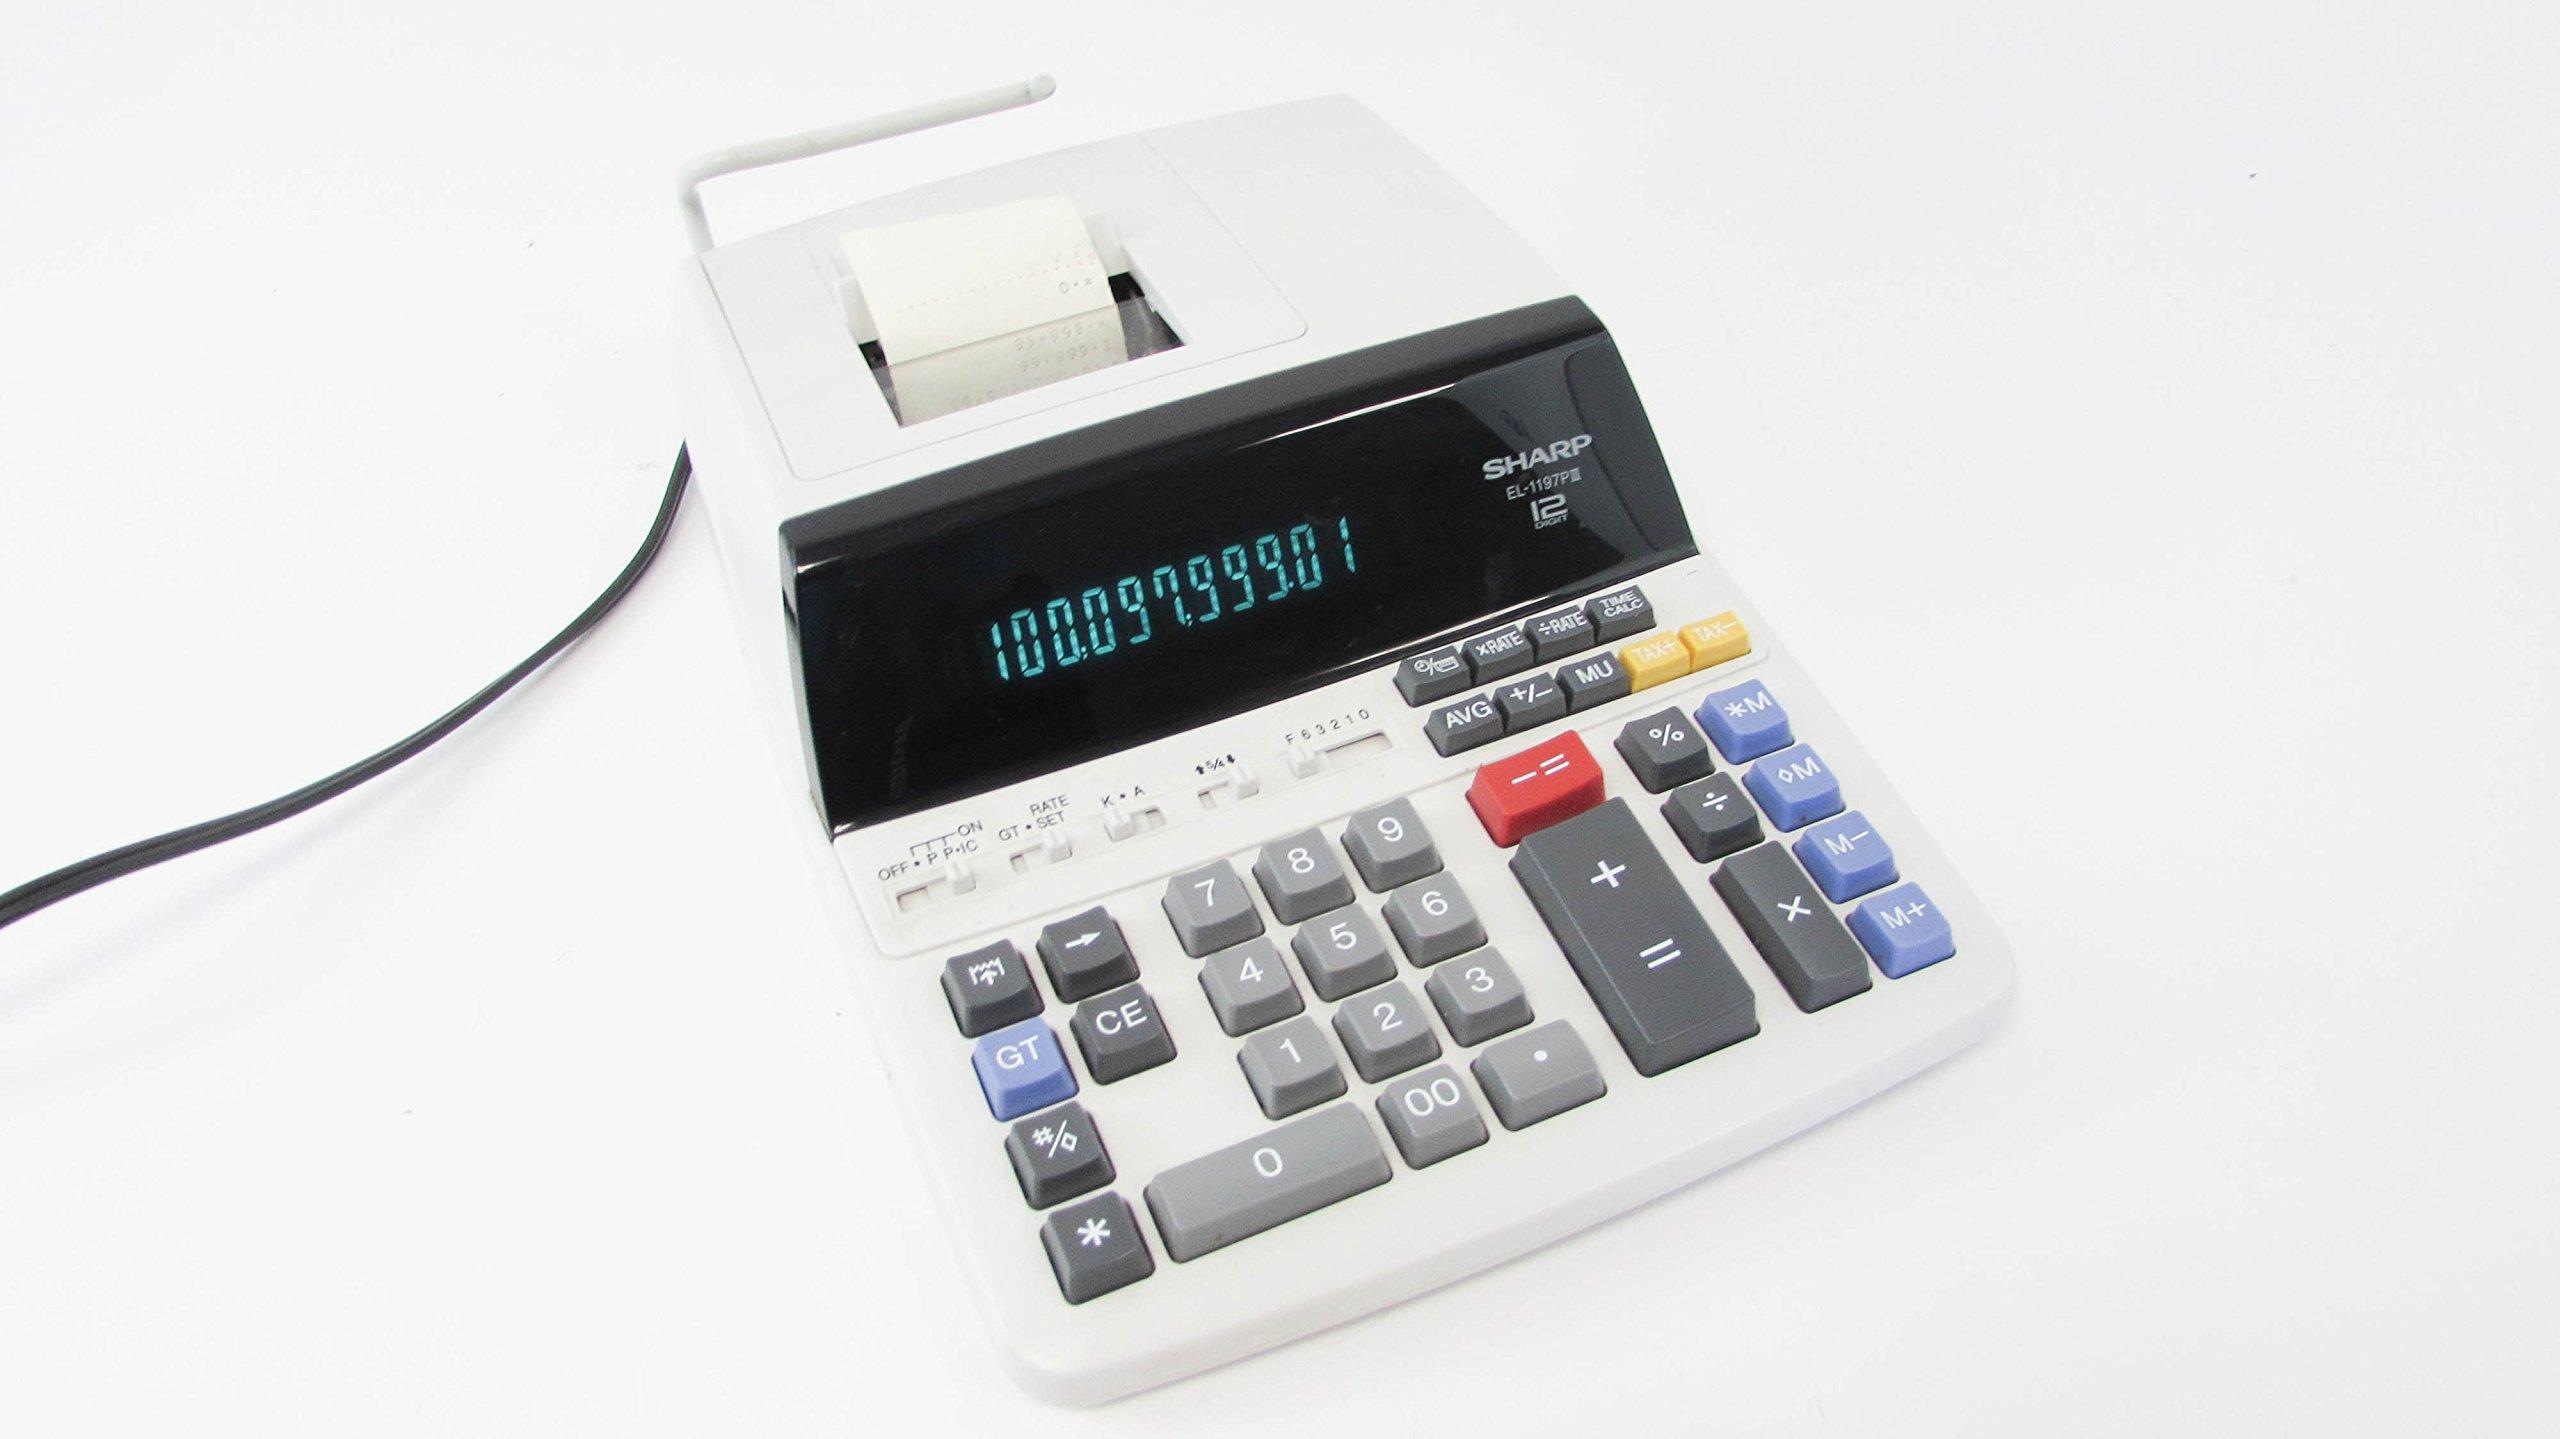 SHARP EL-1197PIII 12-Digit Electronic Printing Calculator by Sharp